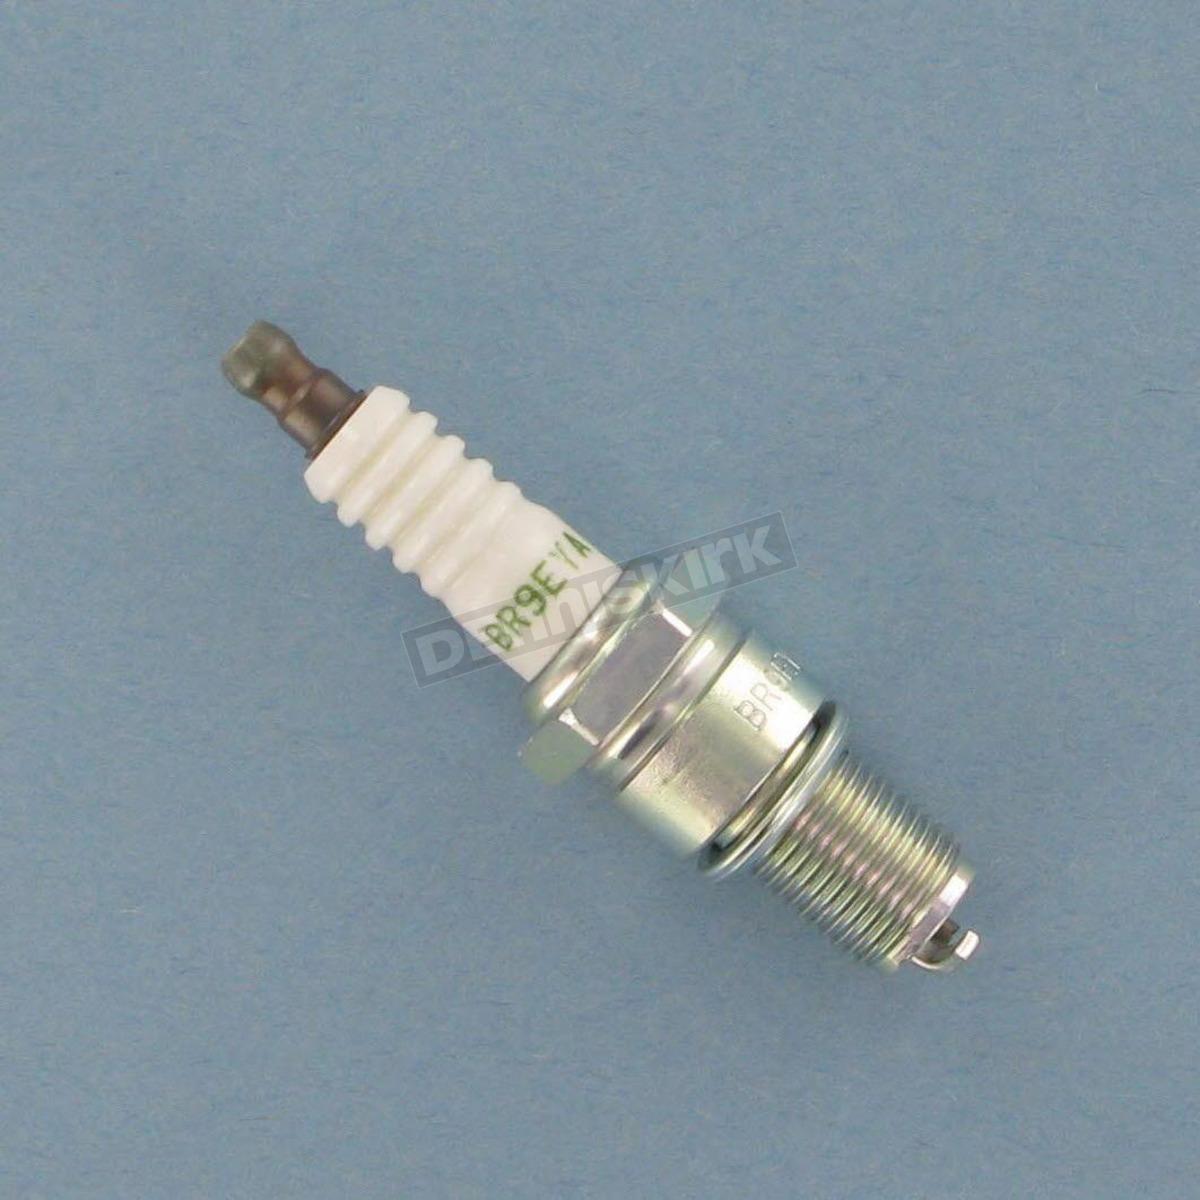 hight resolution of ngk spark plug 7548